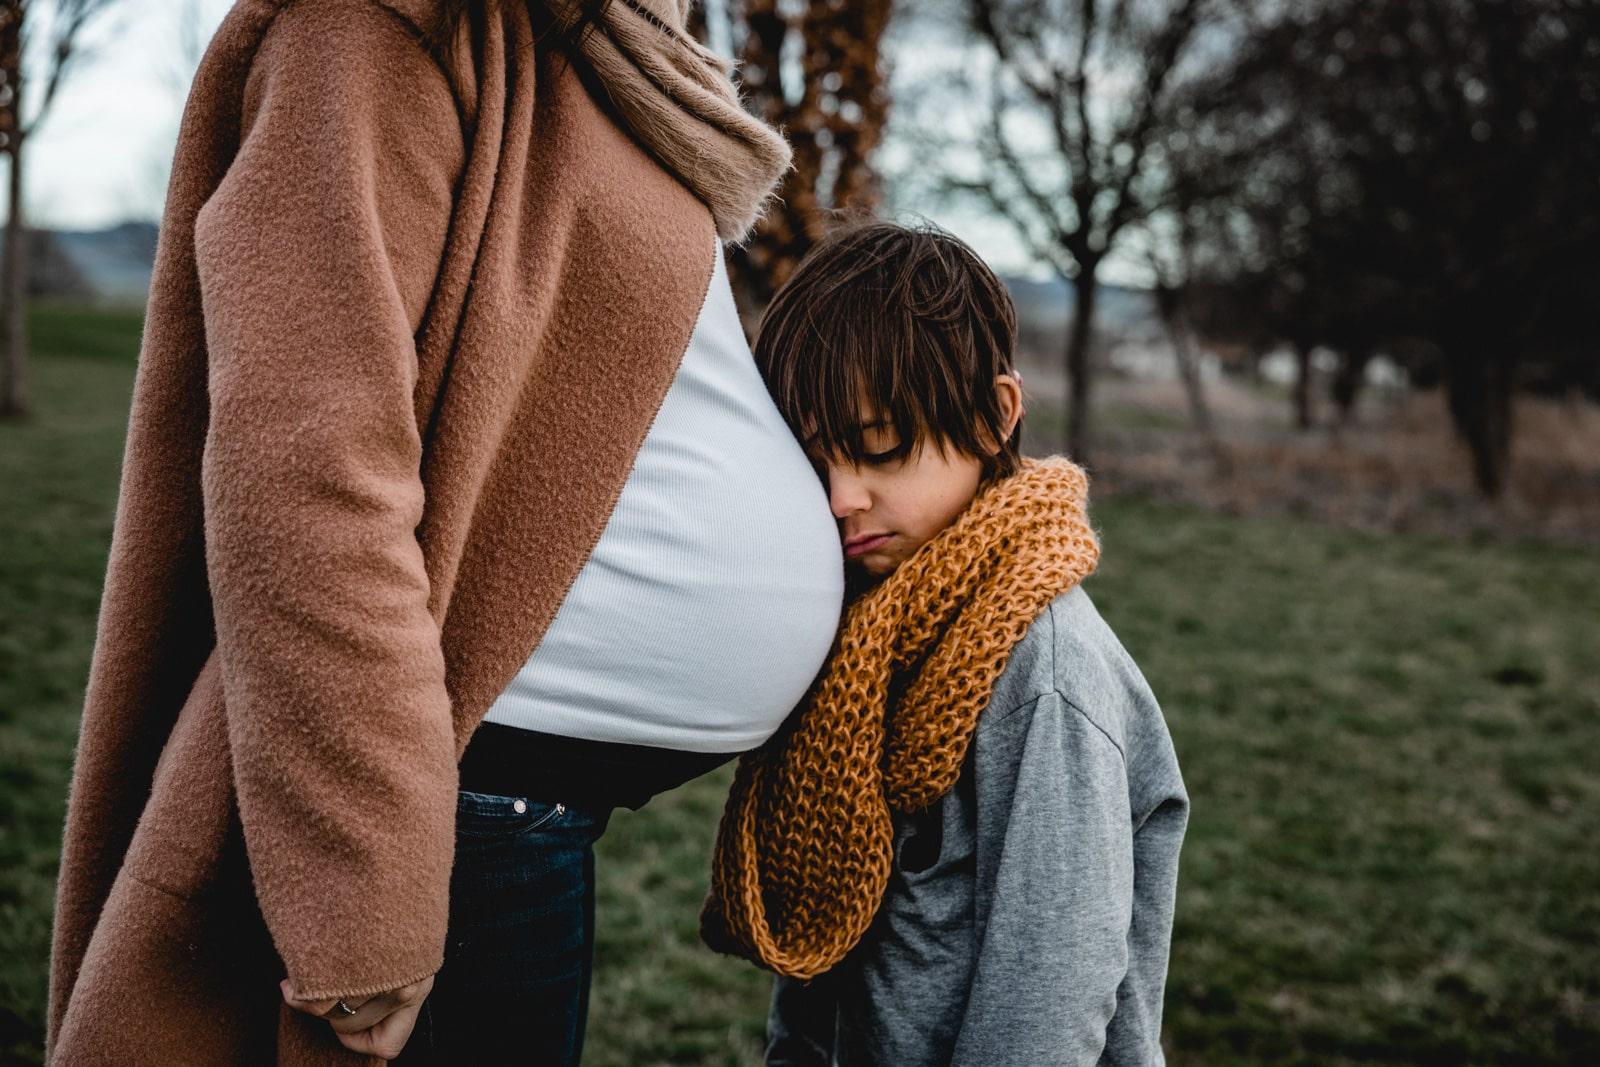 Kind lehnt an den Babybauch der Mama mit Kopf an